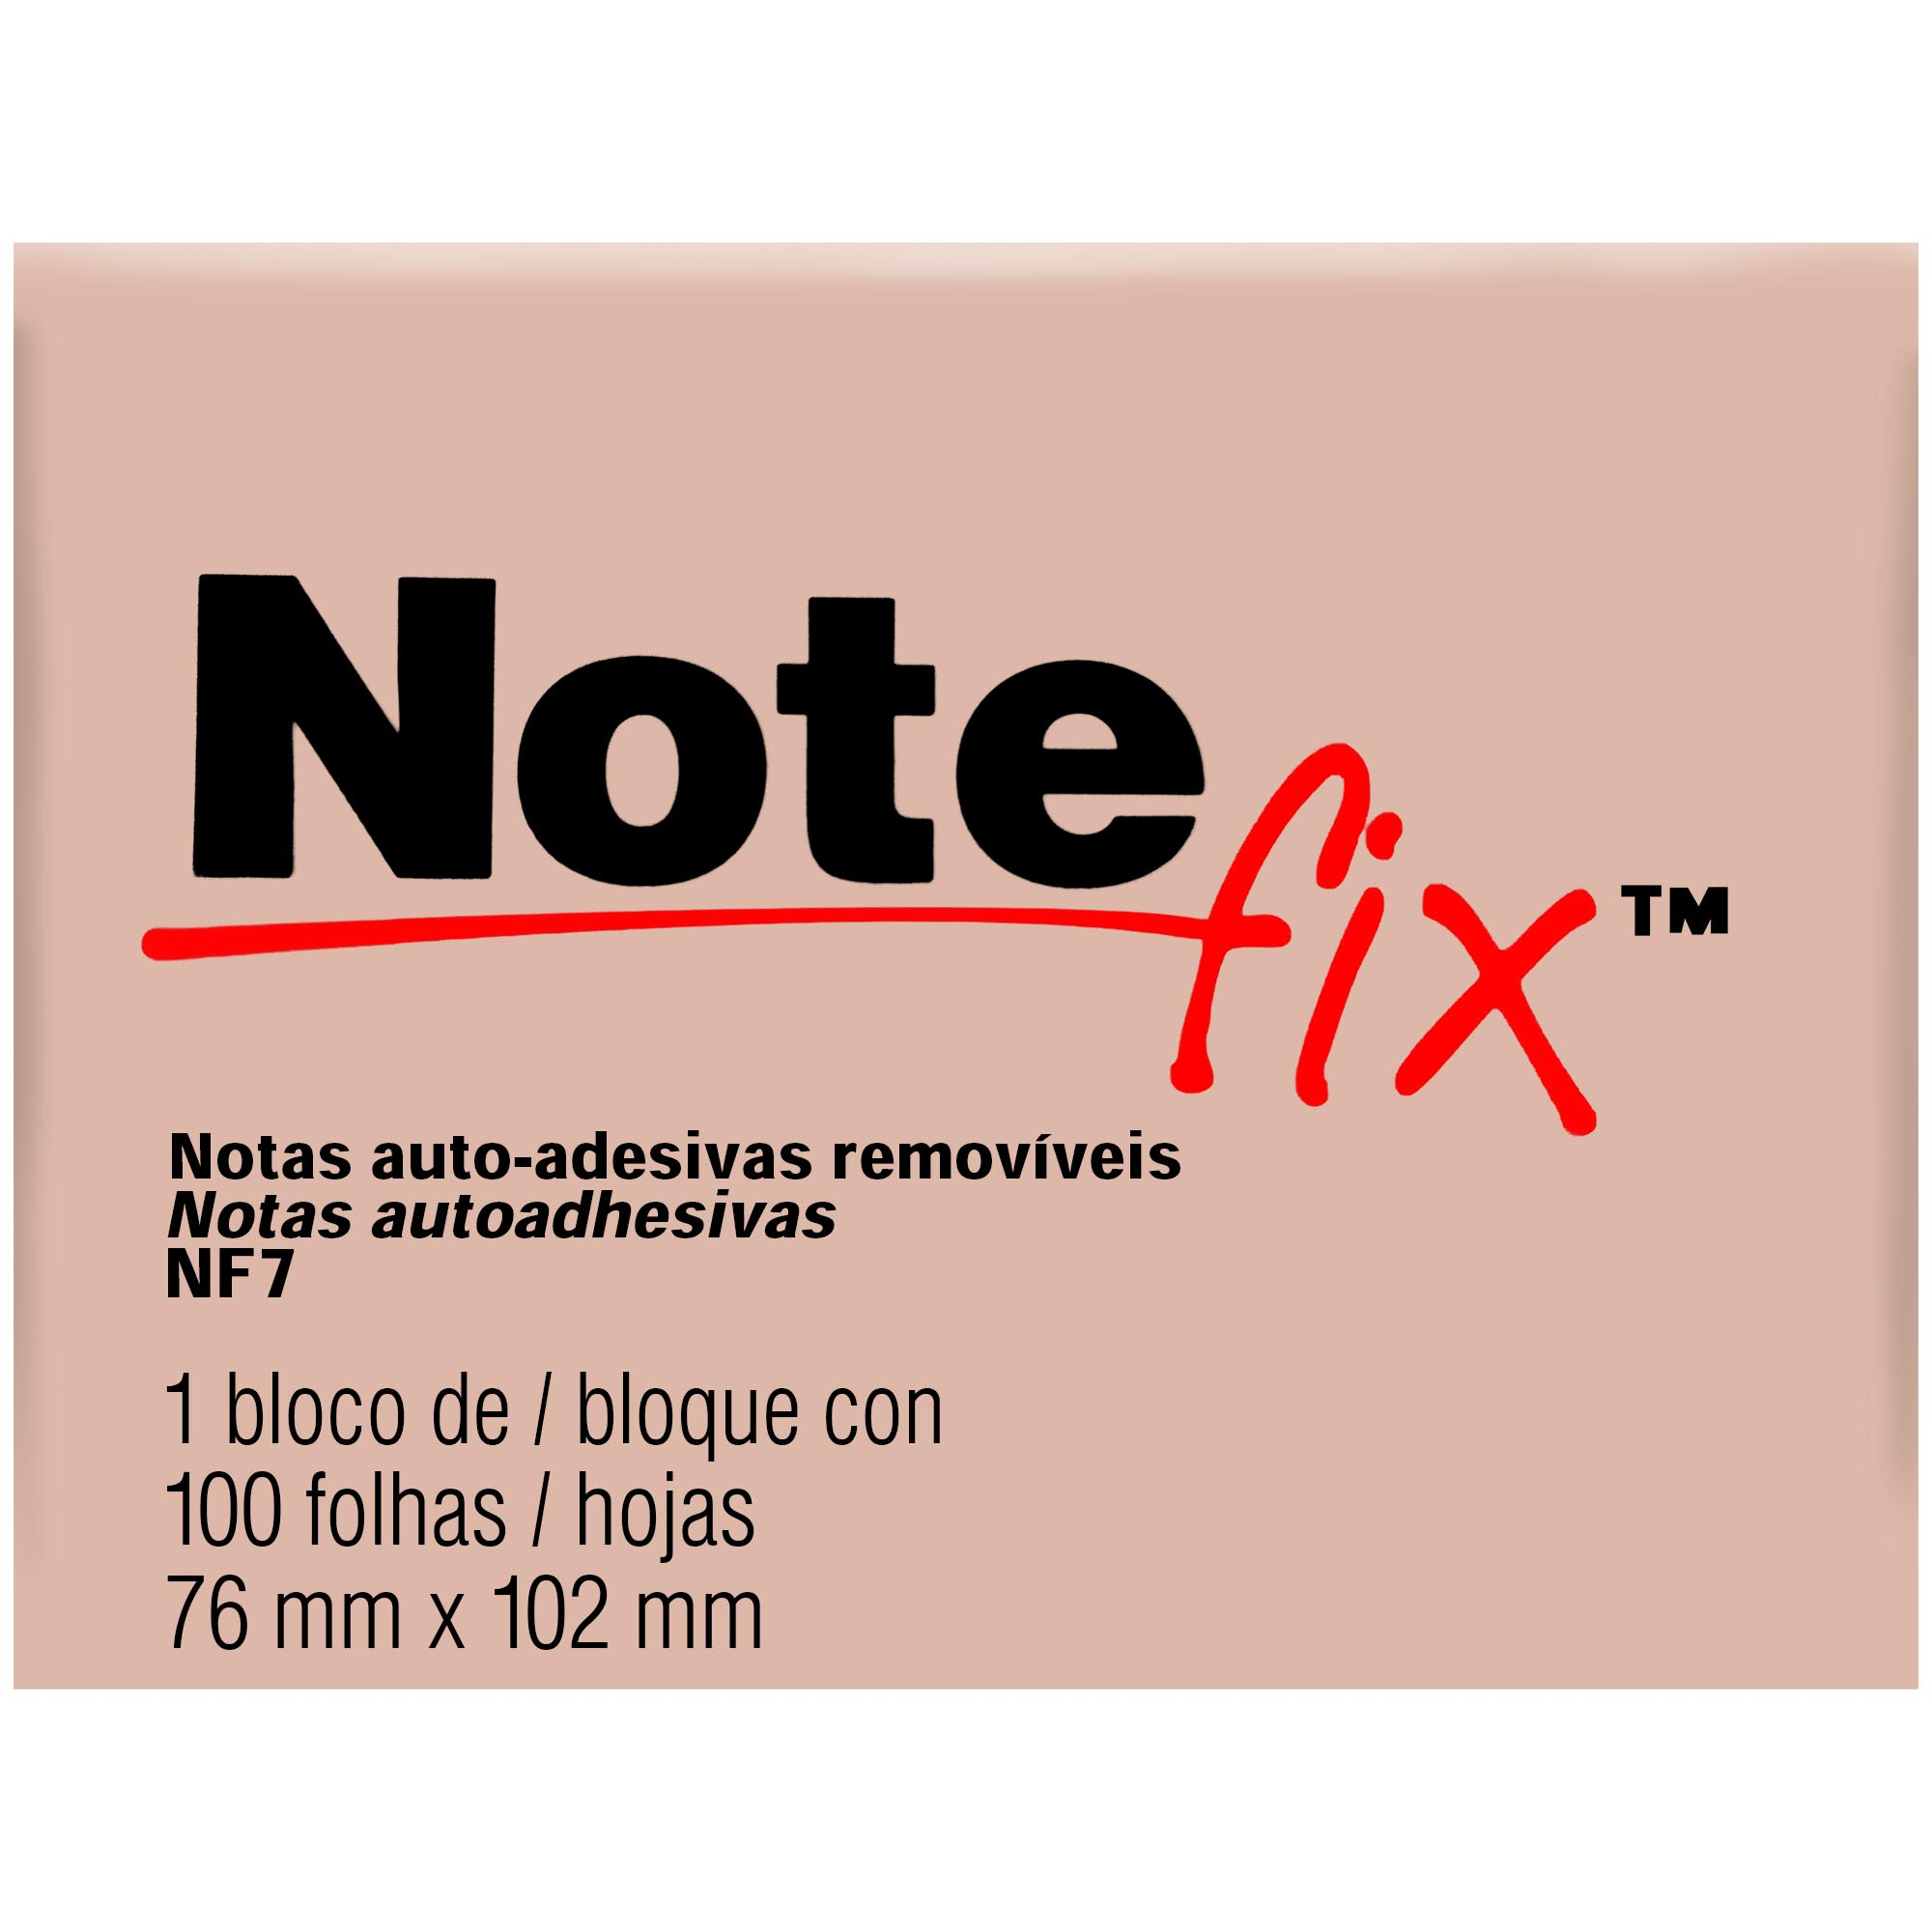 Bloco Autoadesivo Notefix NFX7 76MMX102MM 100FLS Cor Rosa HB004116107 - 3M